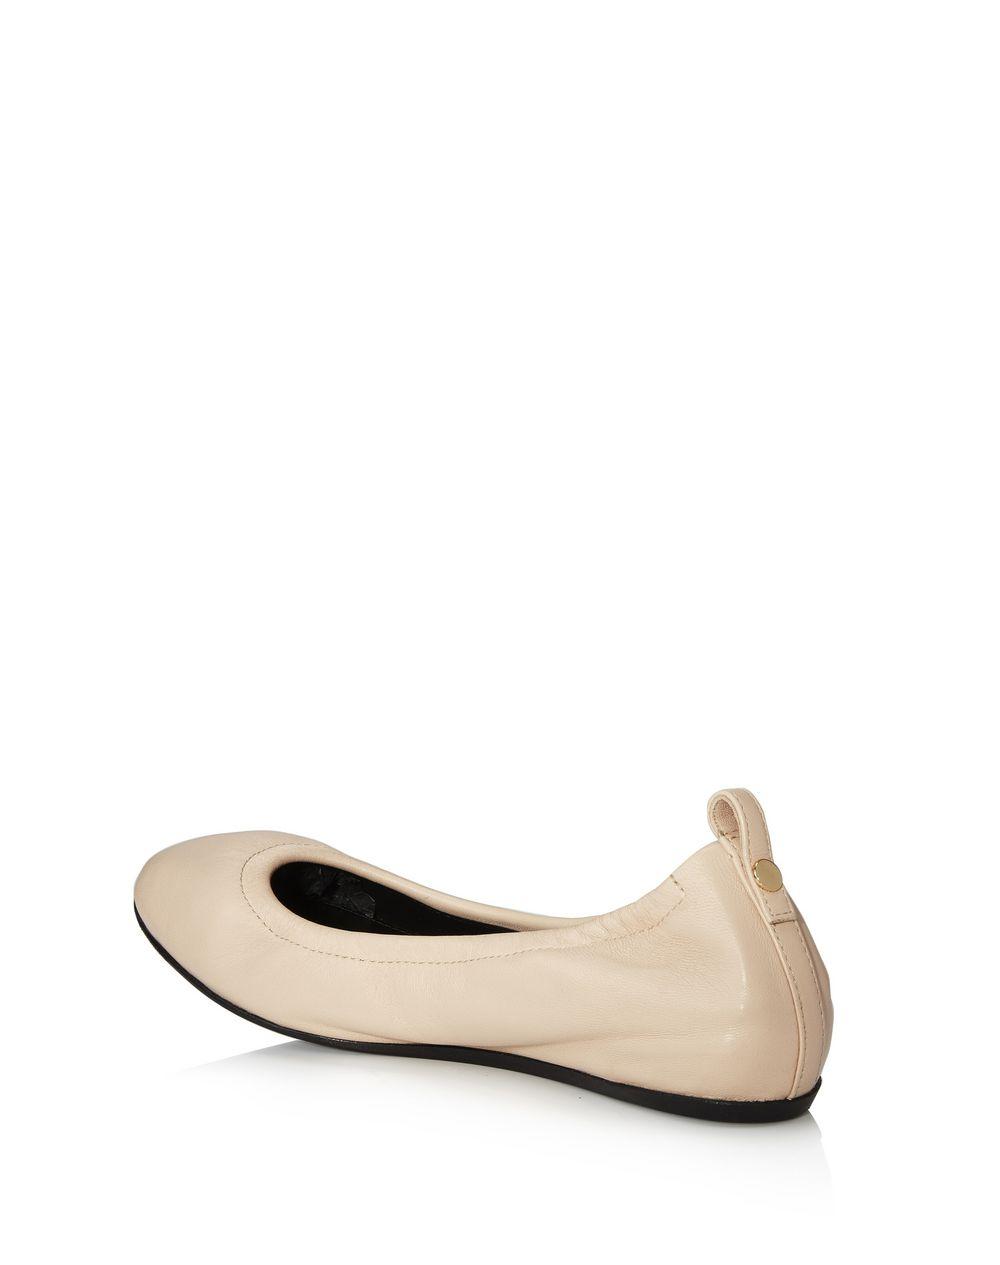 CLASSIC BALLET FLAT - Lanvin